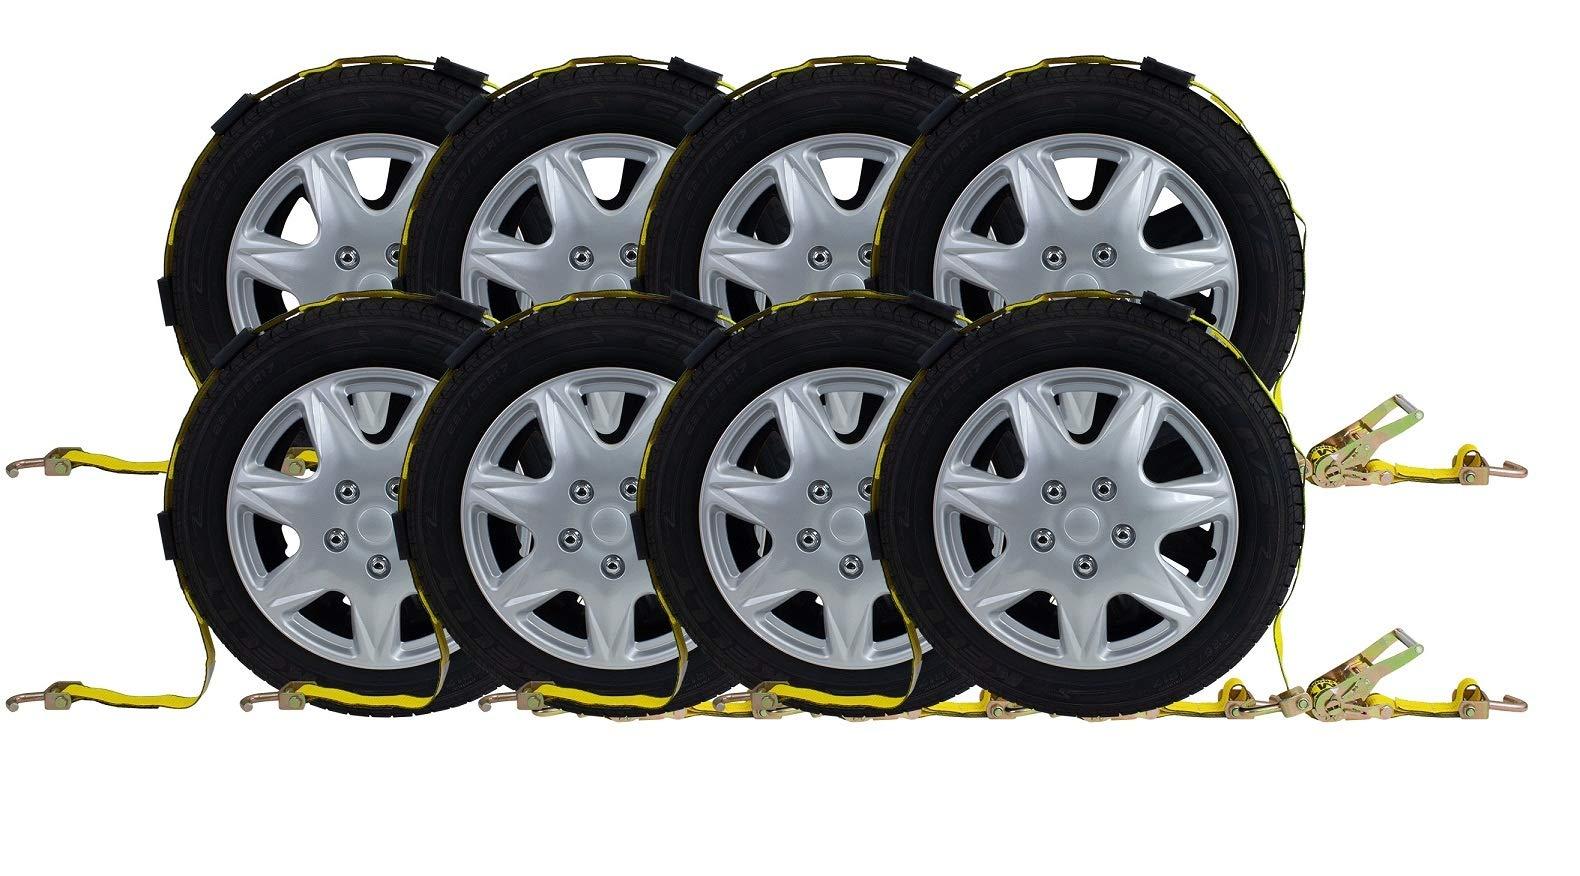 2''x9' Ratchet Tire Wheel Strap Over The Tire Auto Hauler Tie Down Straps (8- Pack w/Swivel J Hooks)